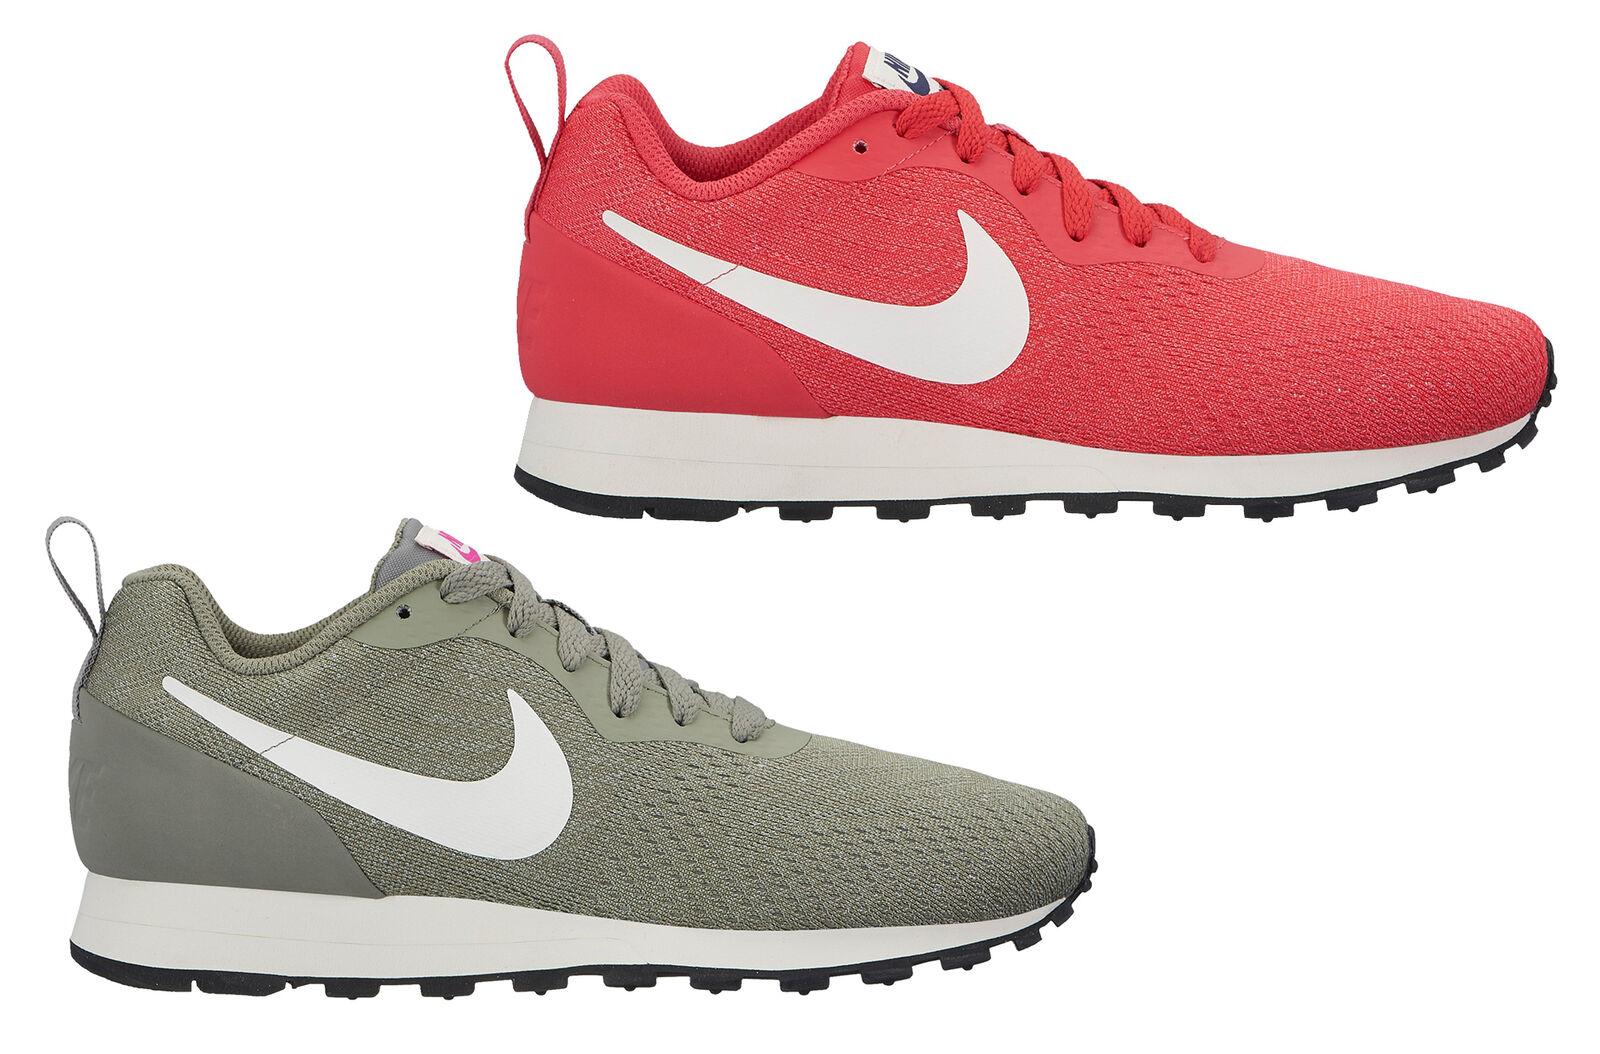 Nike Sneakers MD Runner 2 Damen Sportschuhe Freizeitschuhe Turnschuhe